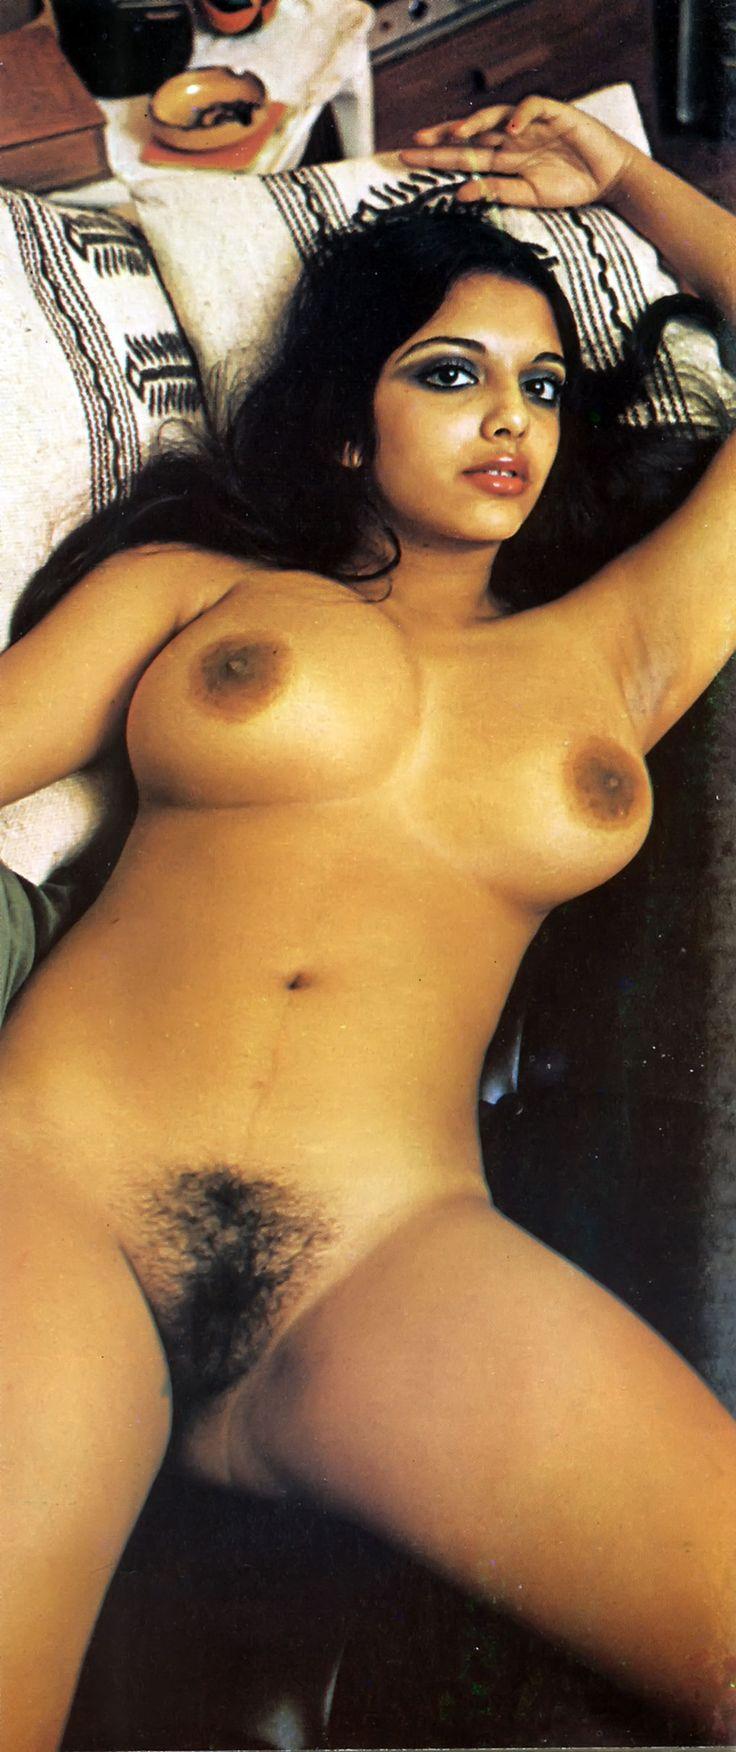 Nude Indian women natural